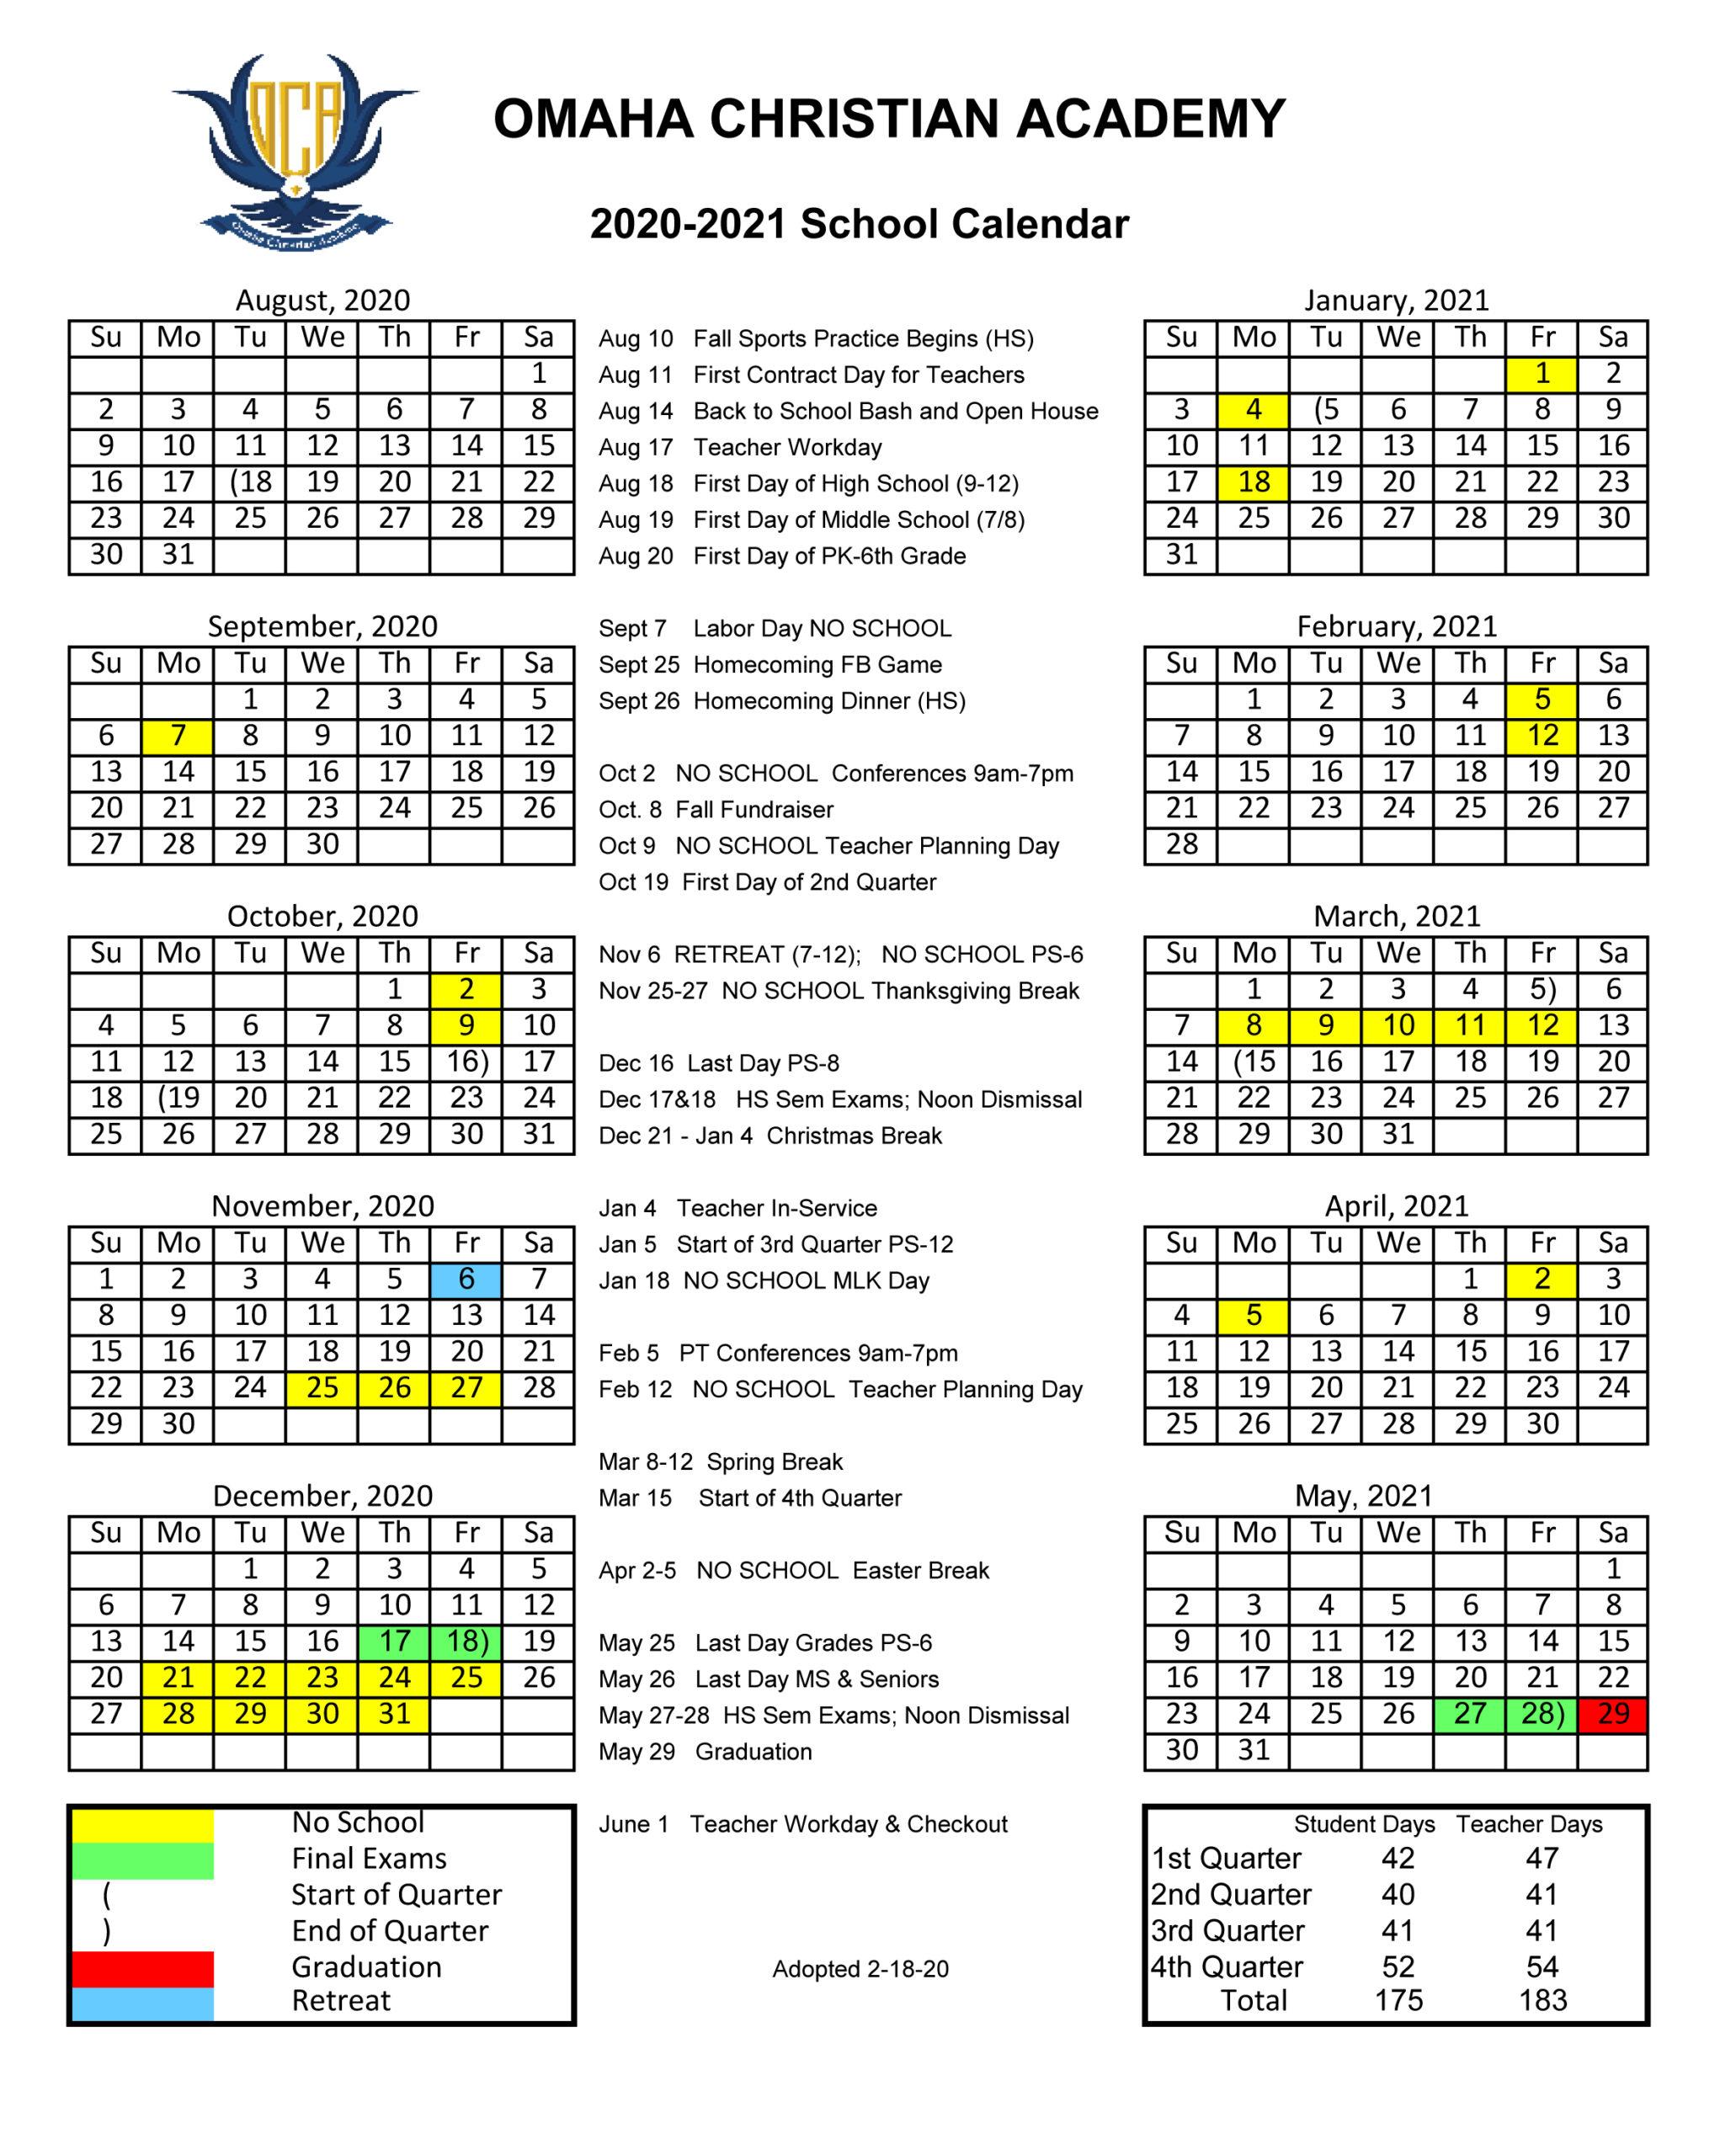 2020/2021 School Calendar - Omaha Christian Academy Within Las Cruces Public Schools Calendar 2021 2020